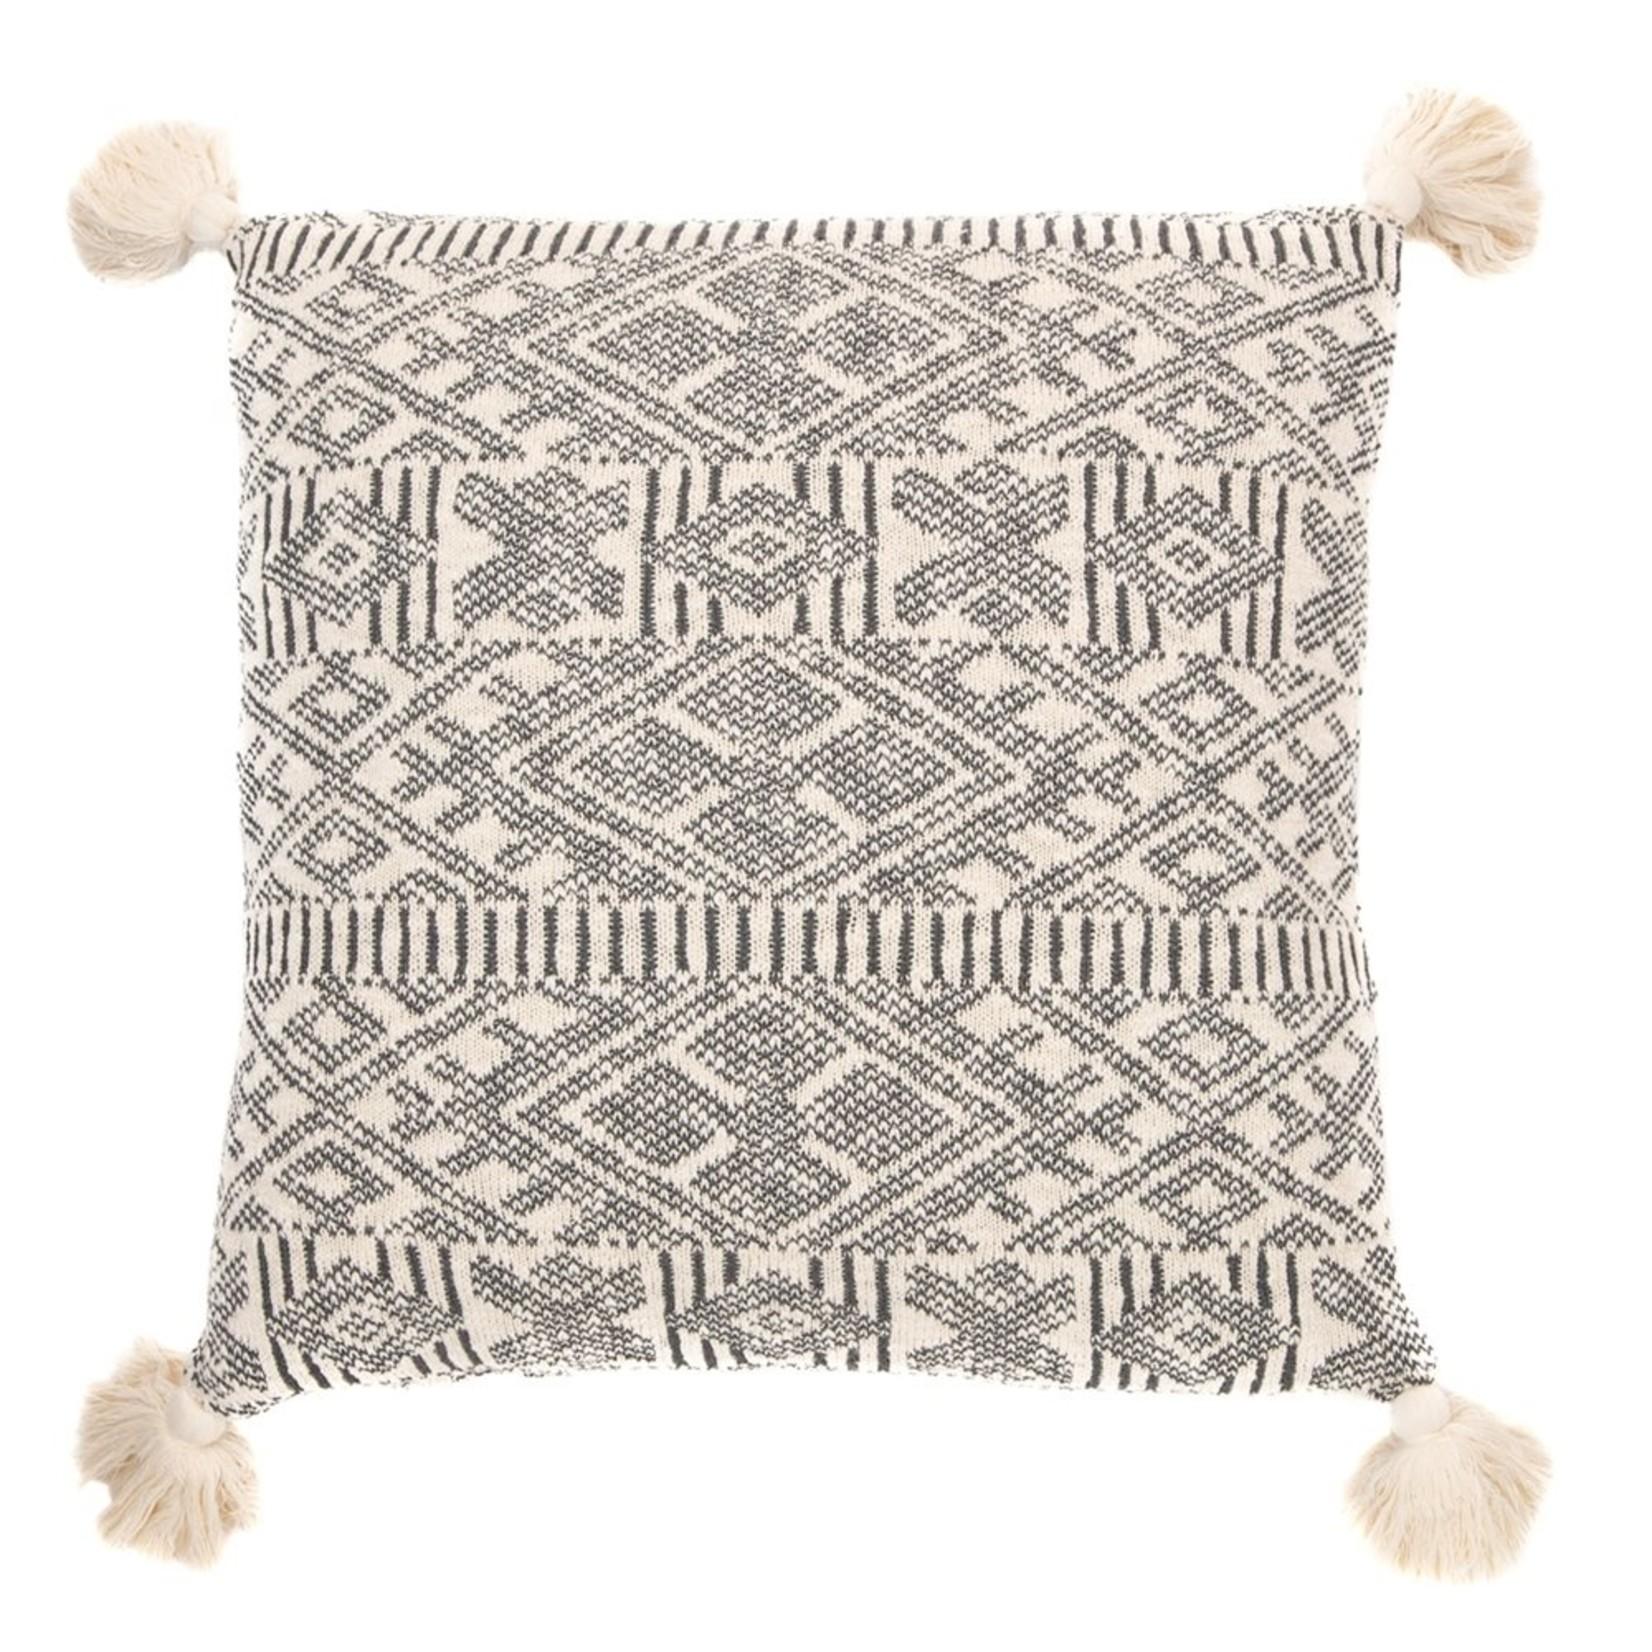 Brunelli Charlotte Knitted Cream Cushion